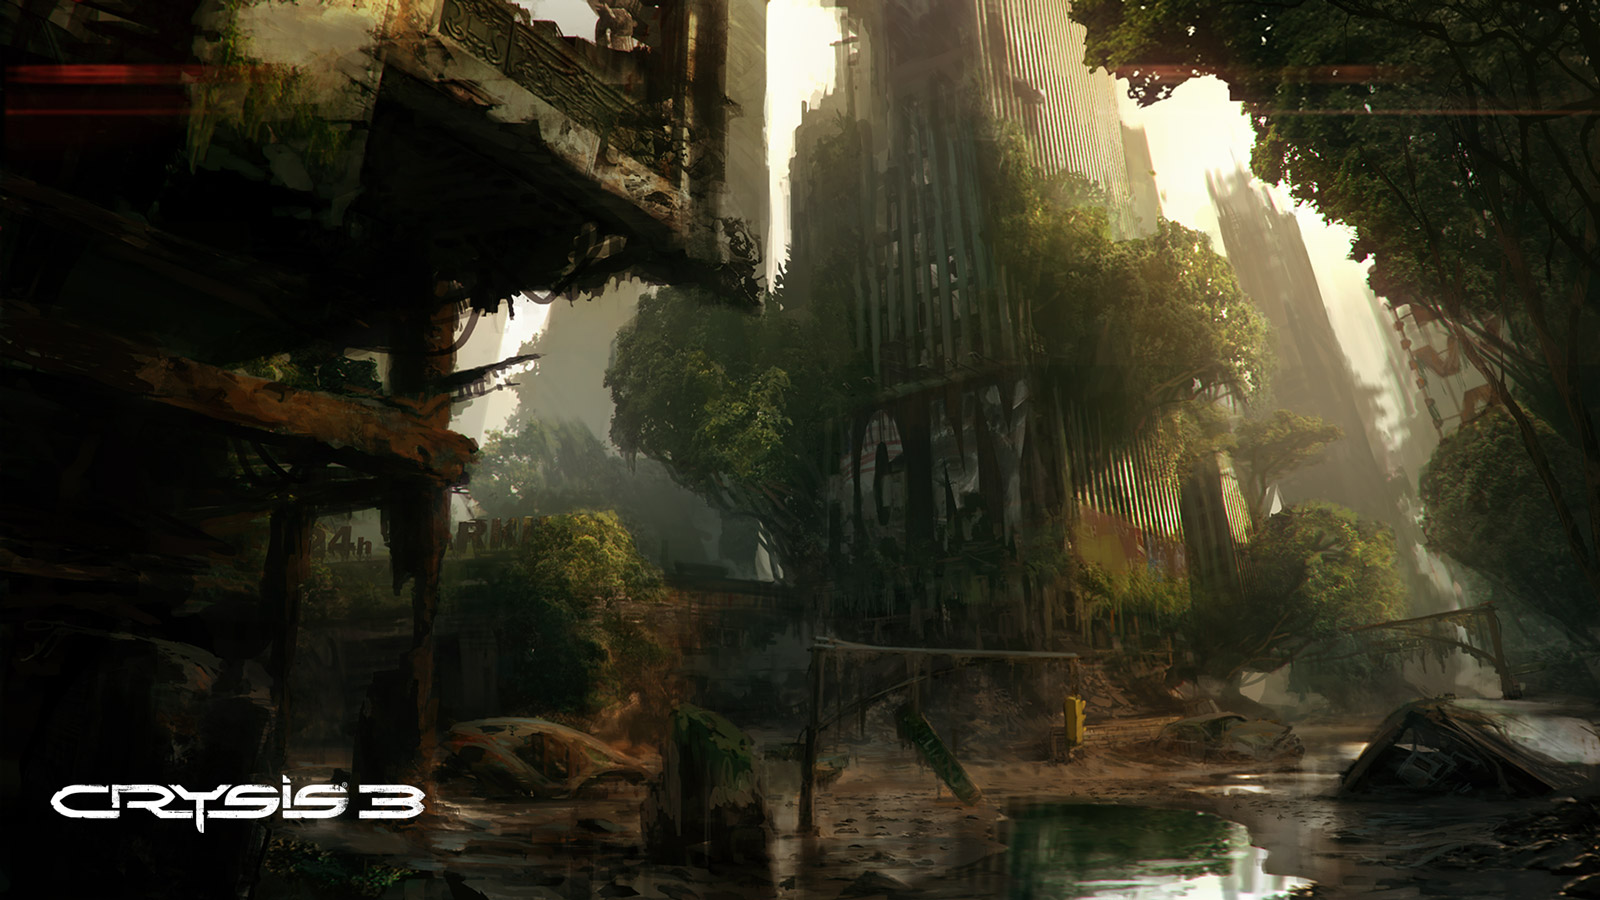 Crysis 3 Wallpaper in 1600x900